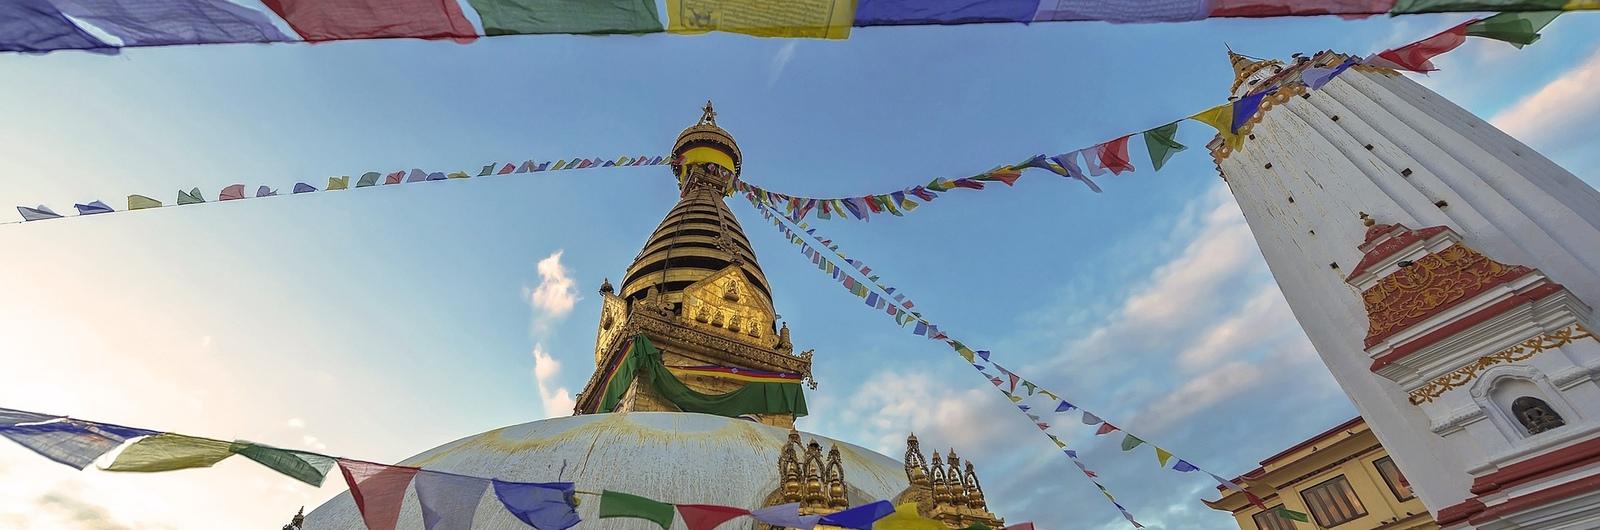 kathmandu city header